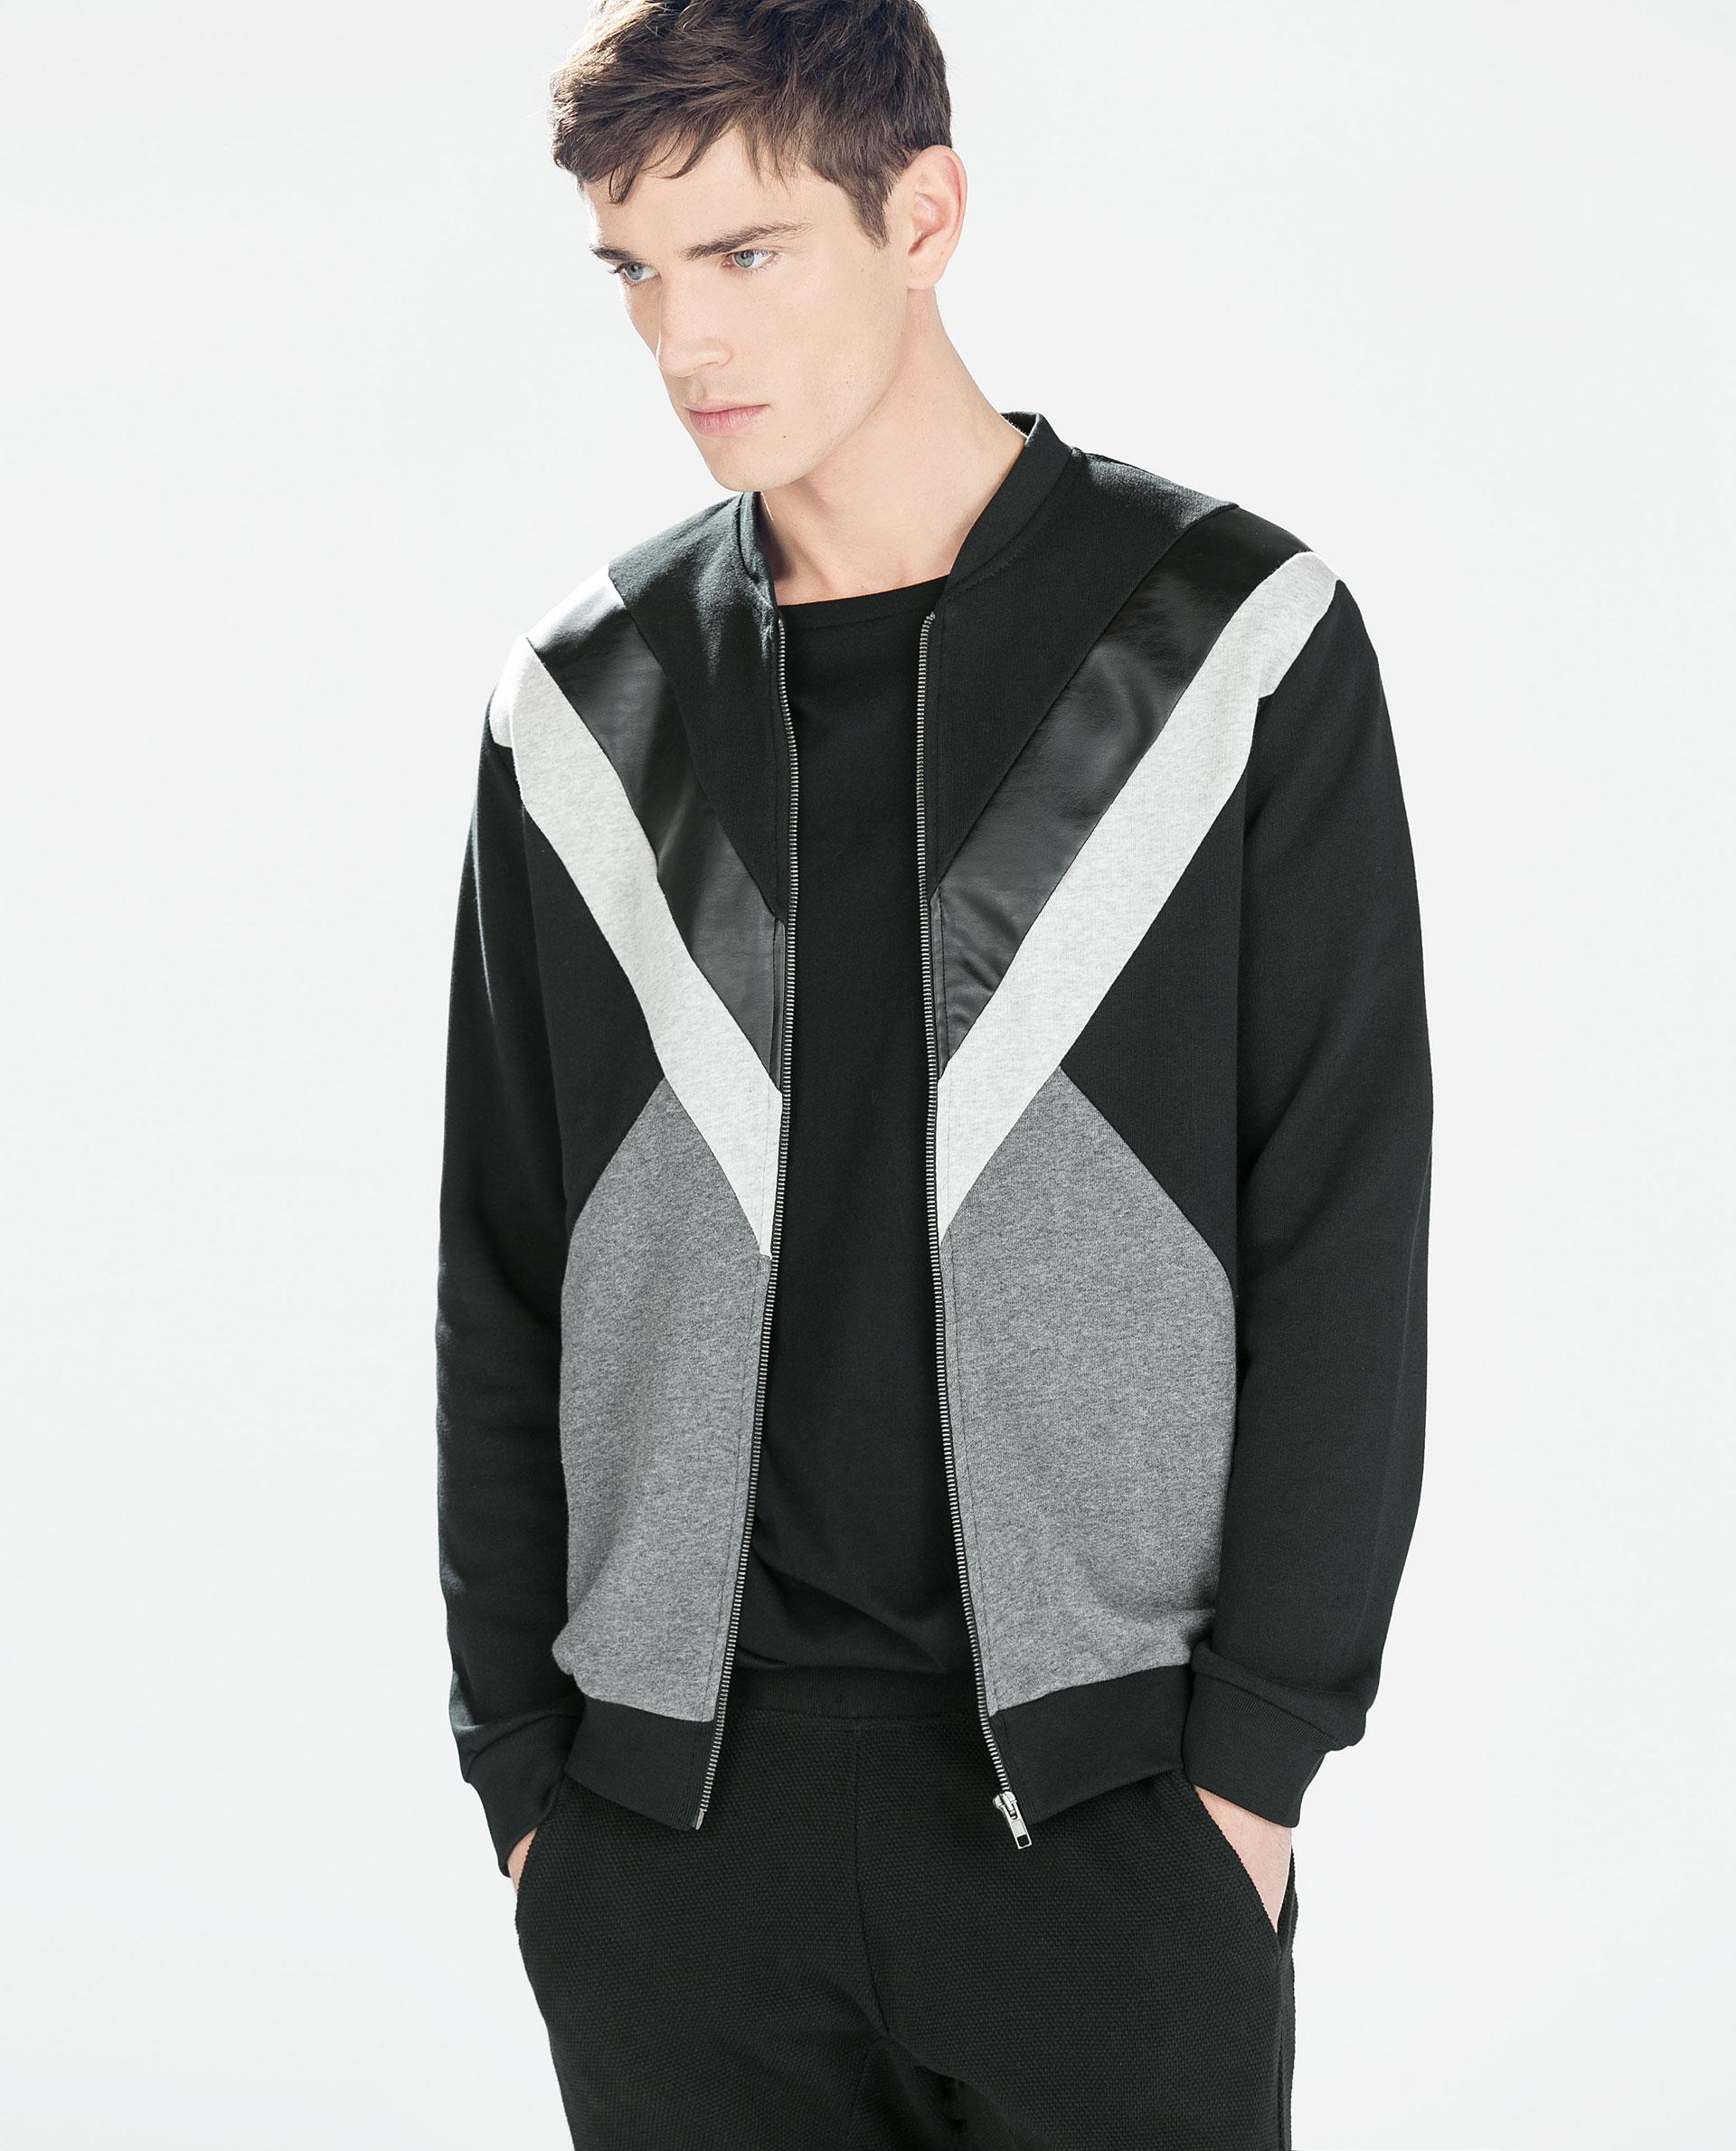 Find great deals on eBay for zara jacket. Shop with confidence. Skip to main content. eBay: ZARA Men's Coats and Jackets. Zara Women's Kimono Jacket. Zara Basic Jackets for Men. Zara Basic Jackets Black Coats & Jackets for Men. Feedback. Leave .